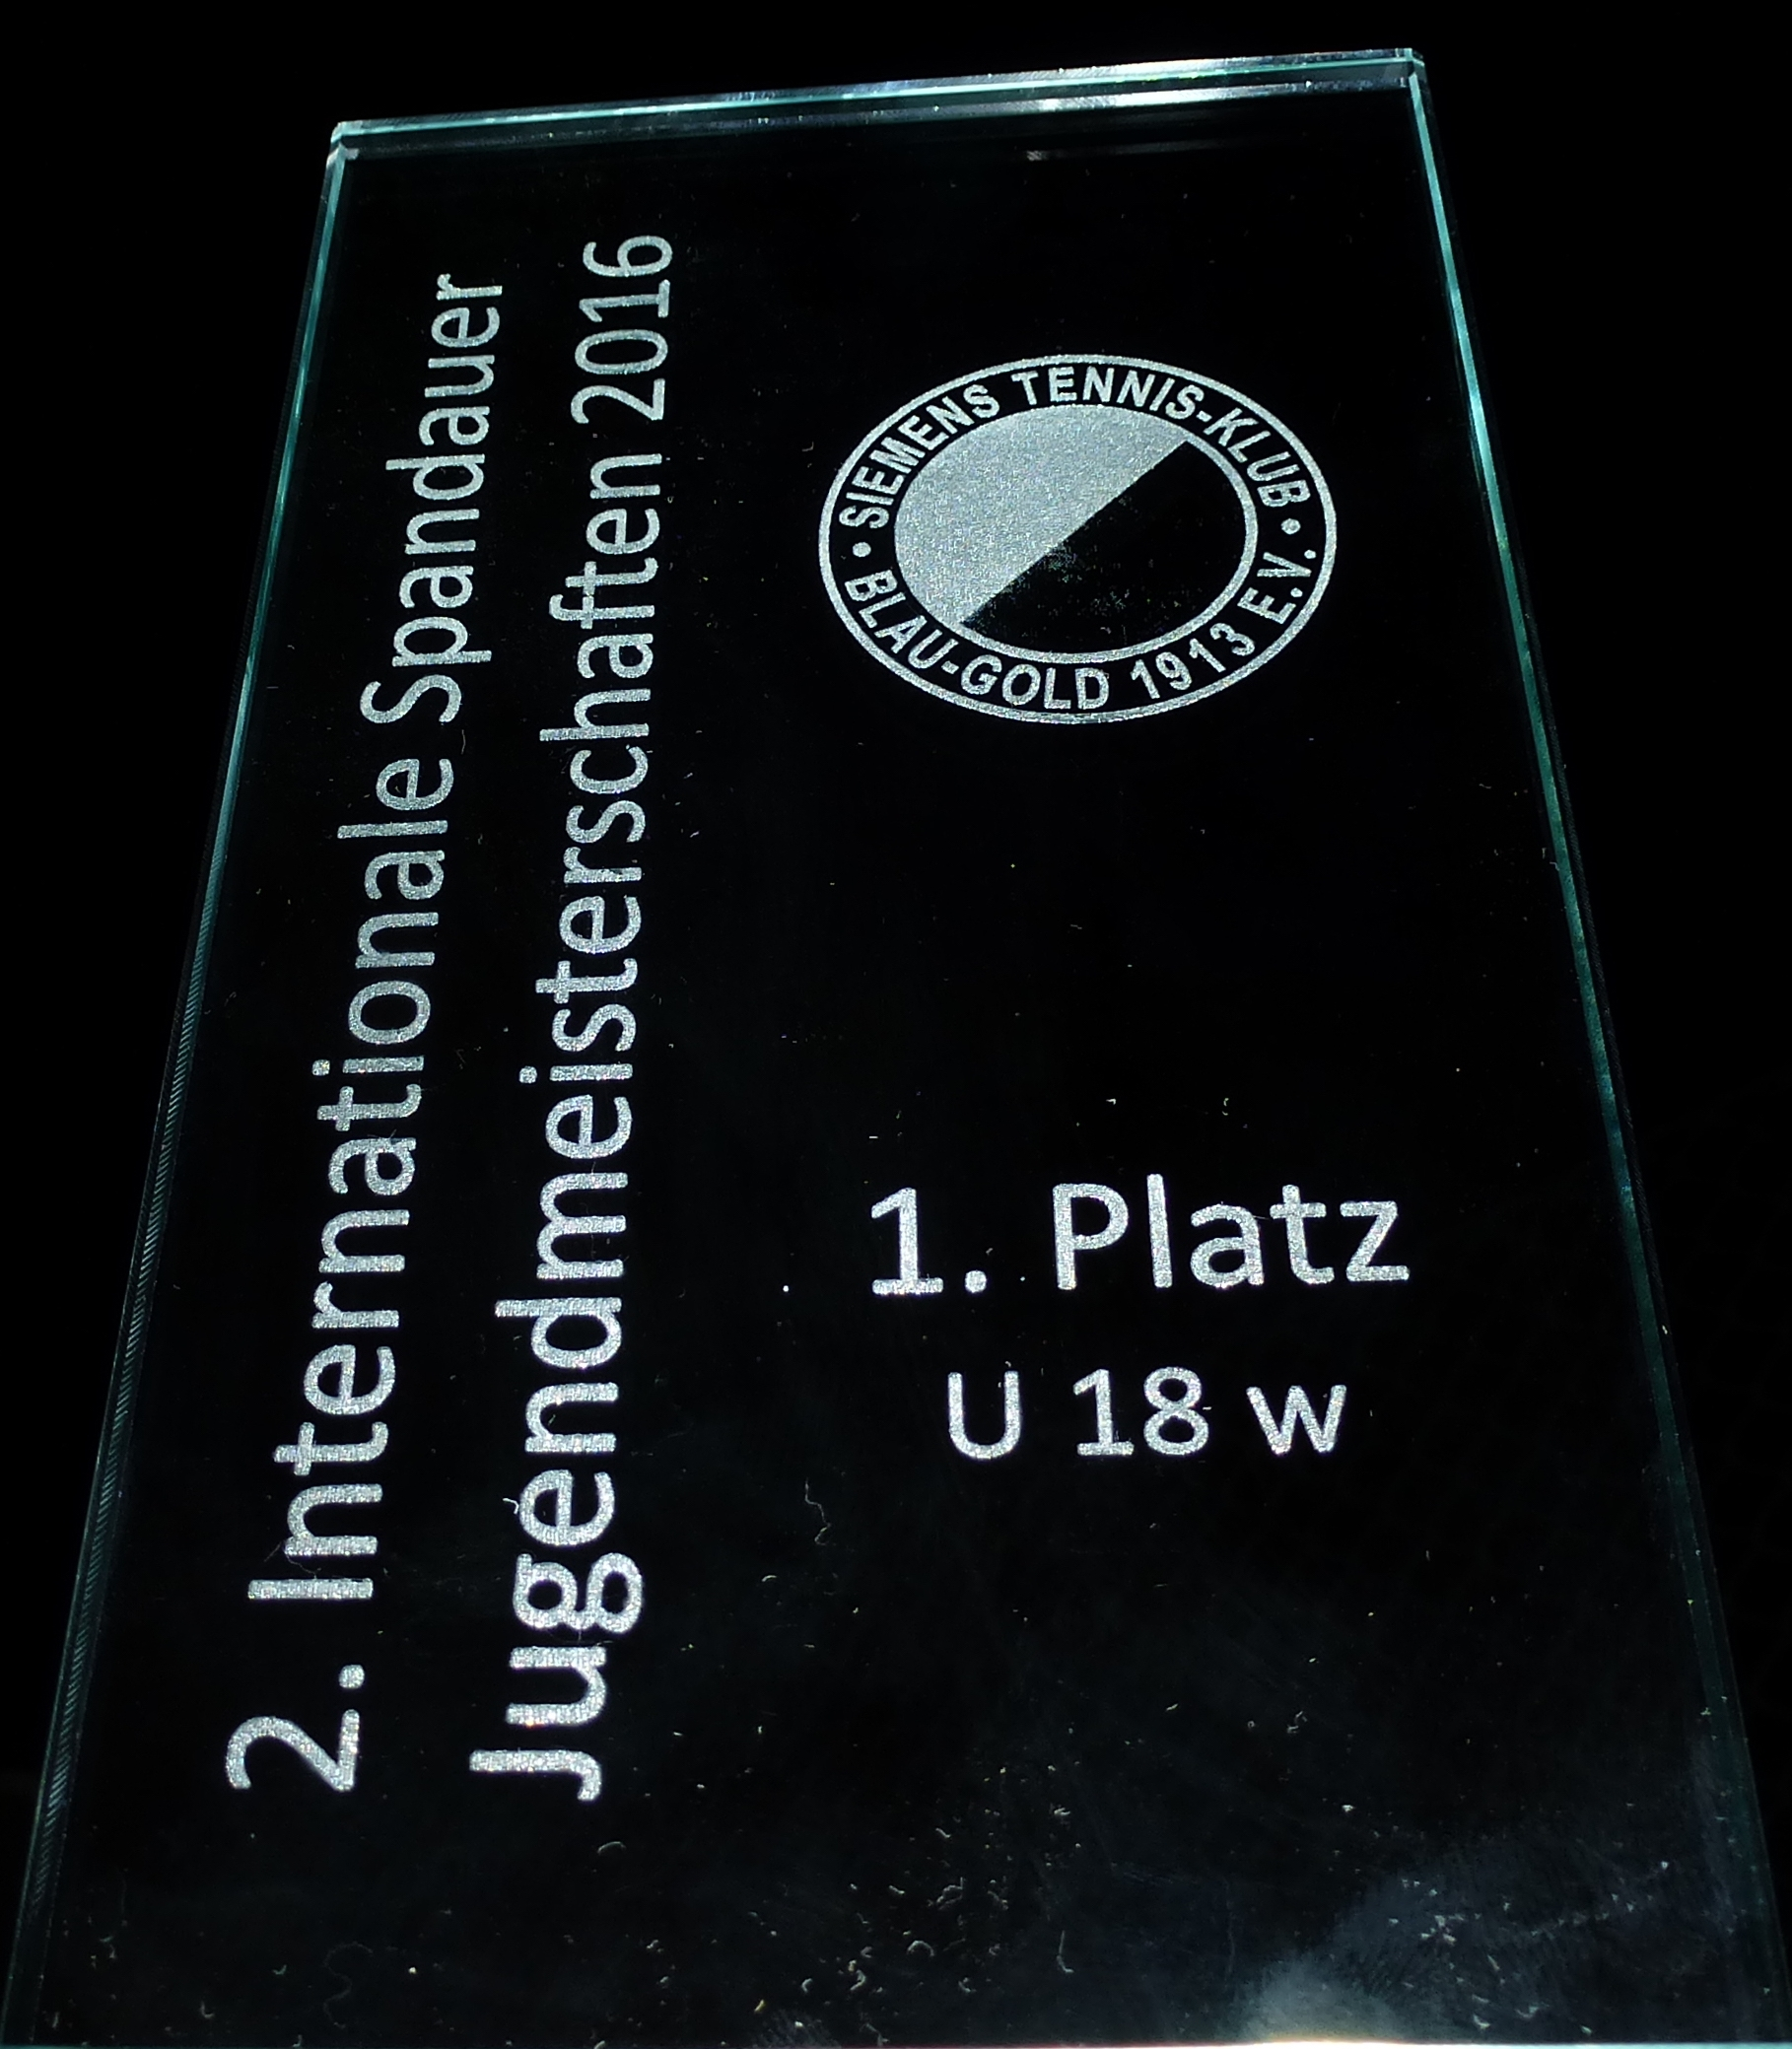 Pokal 2. Internationale Spandauer Jugendmeisterschaften 2016